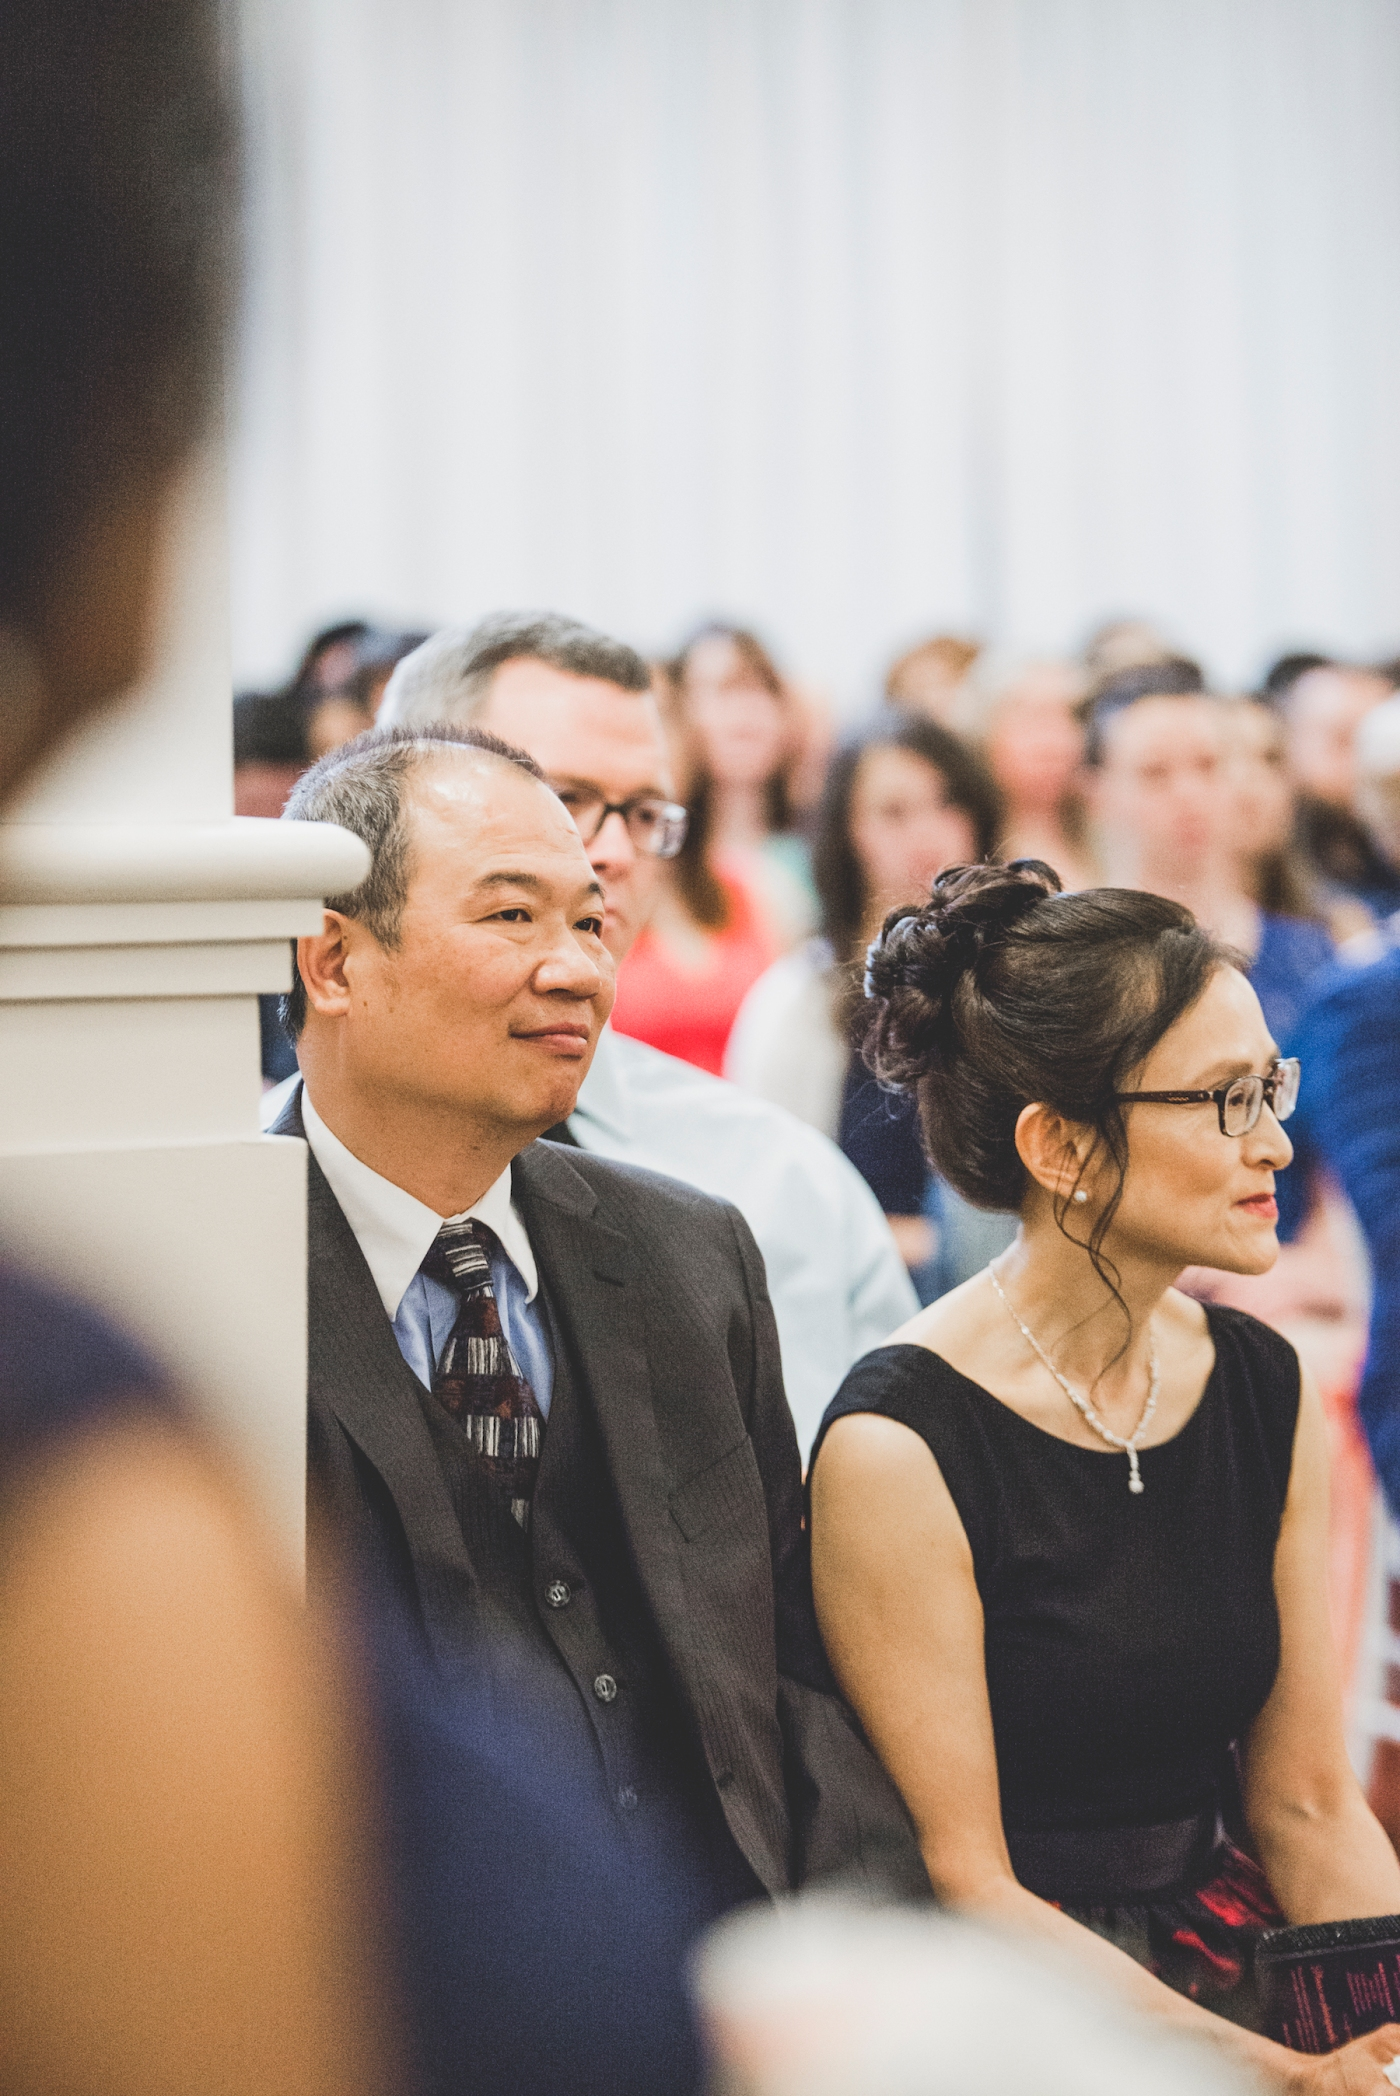 DSC_2650Everett_Wedding_Ballroom_Jane_Speleers_photography_Rachel_and_Edmund_Ceremony_2017